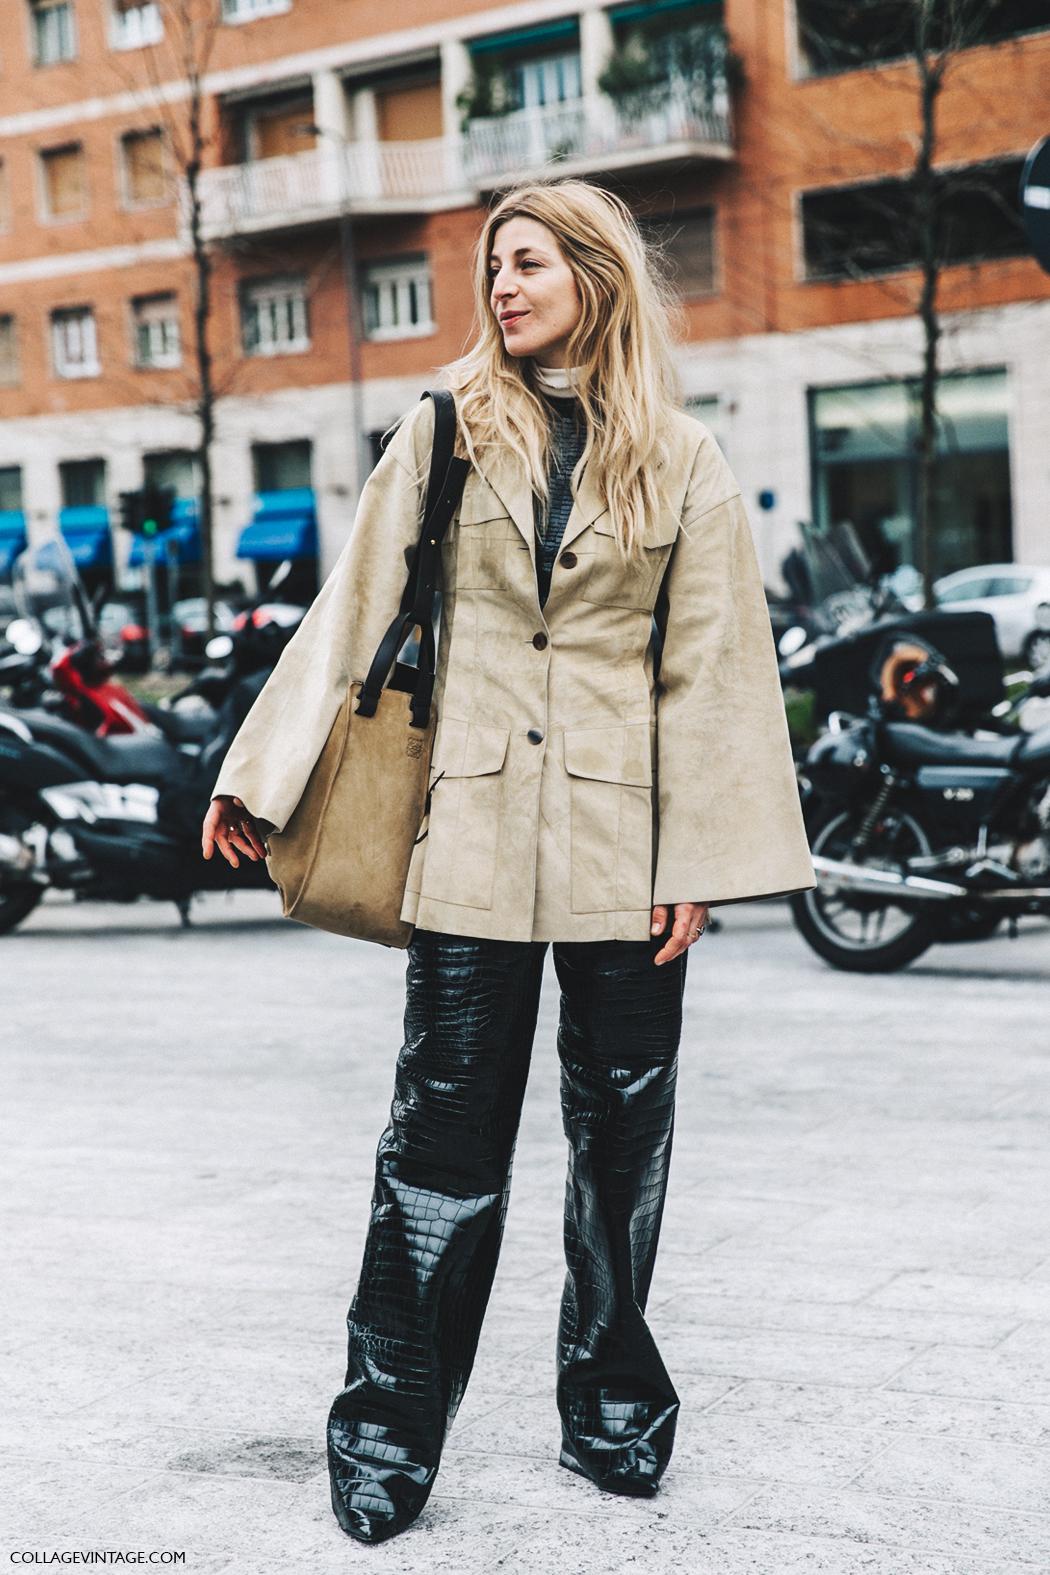 Milan_Fashion_Week_Fall_16-MFW-Street_Style-Collage_Vintage-Ada_kokosar-Leather_trousers-2